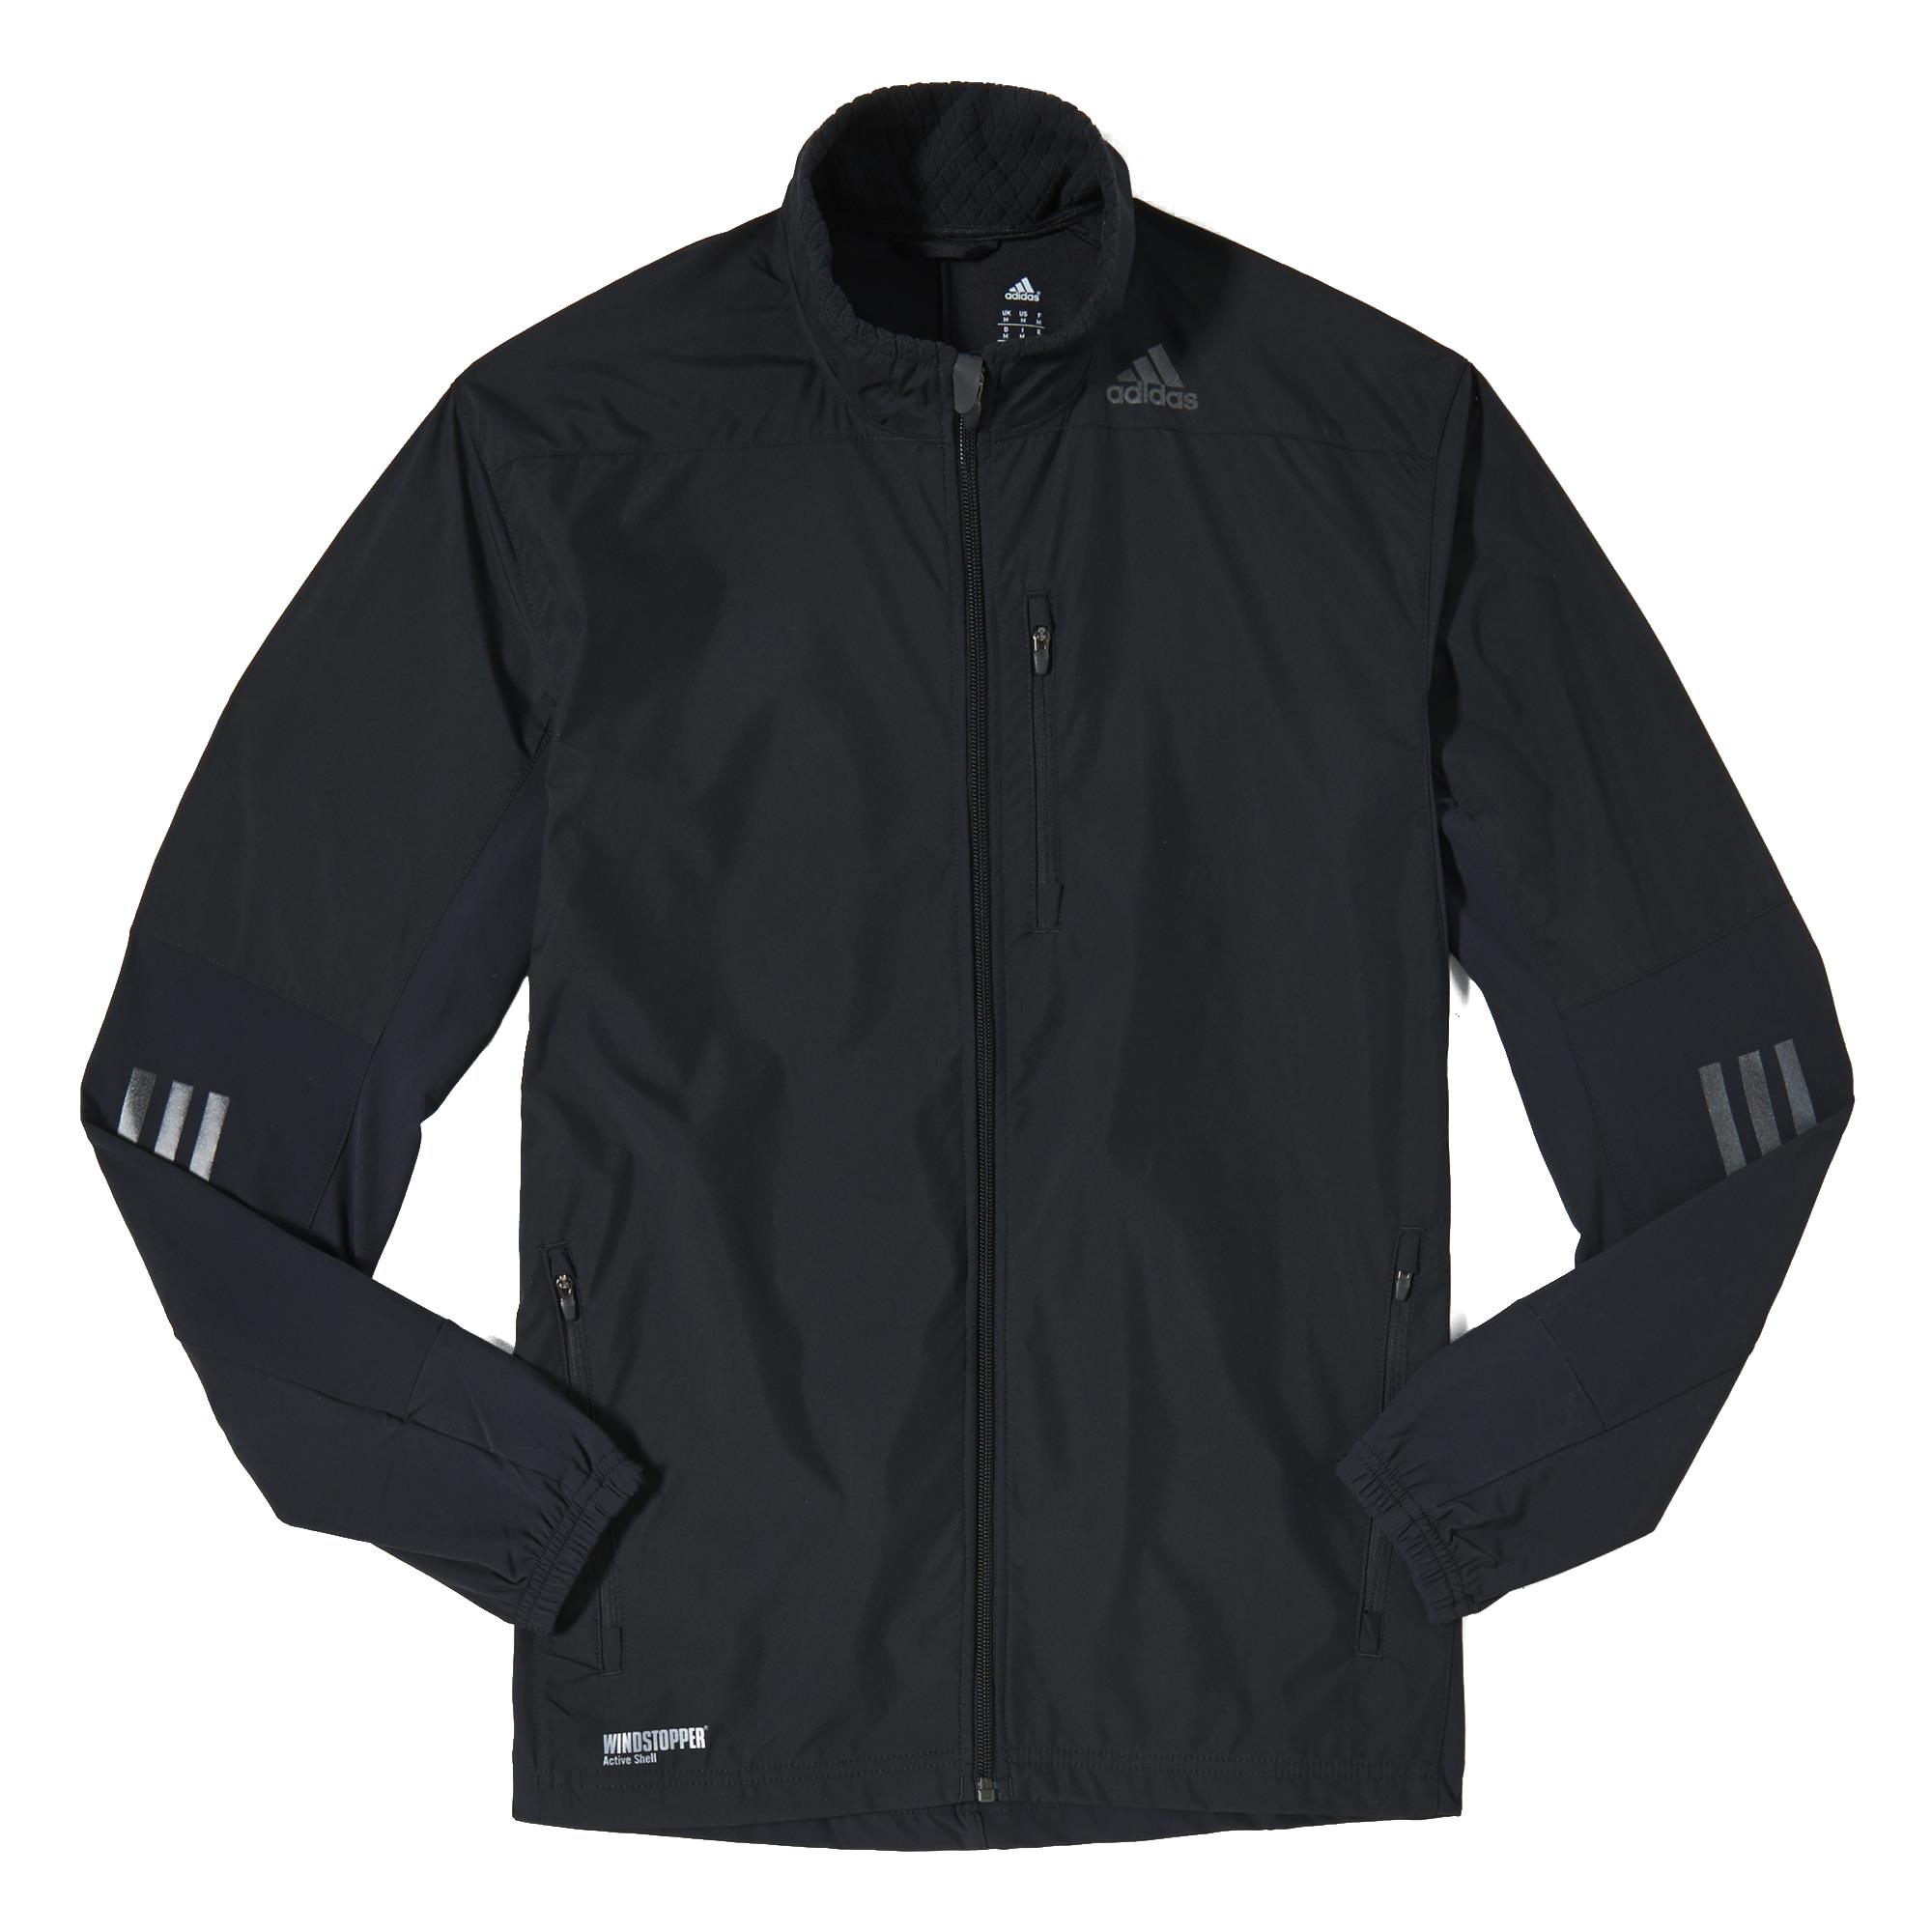 Adidas veste coupe vent supernova gore - Veste coupe vent adidas femme ...